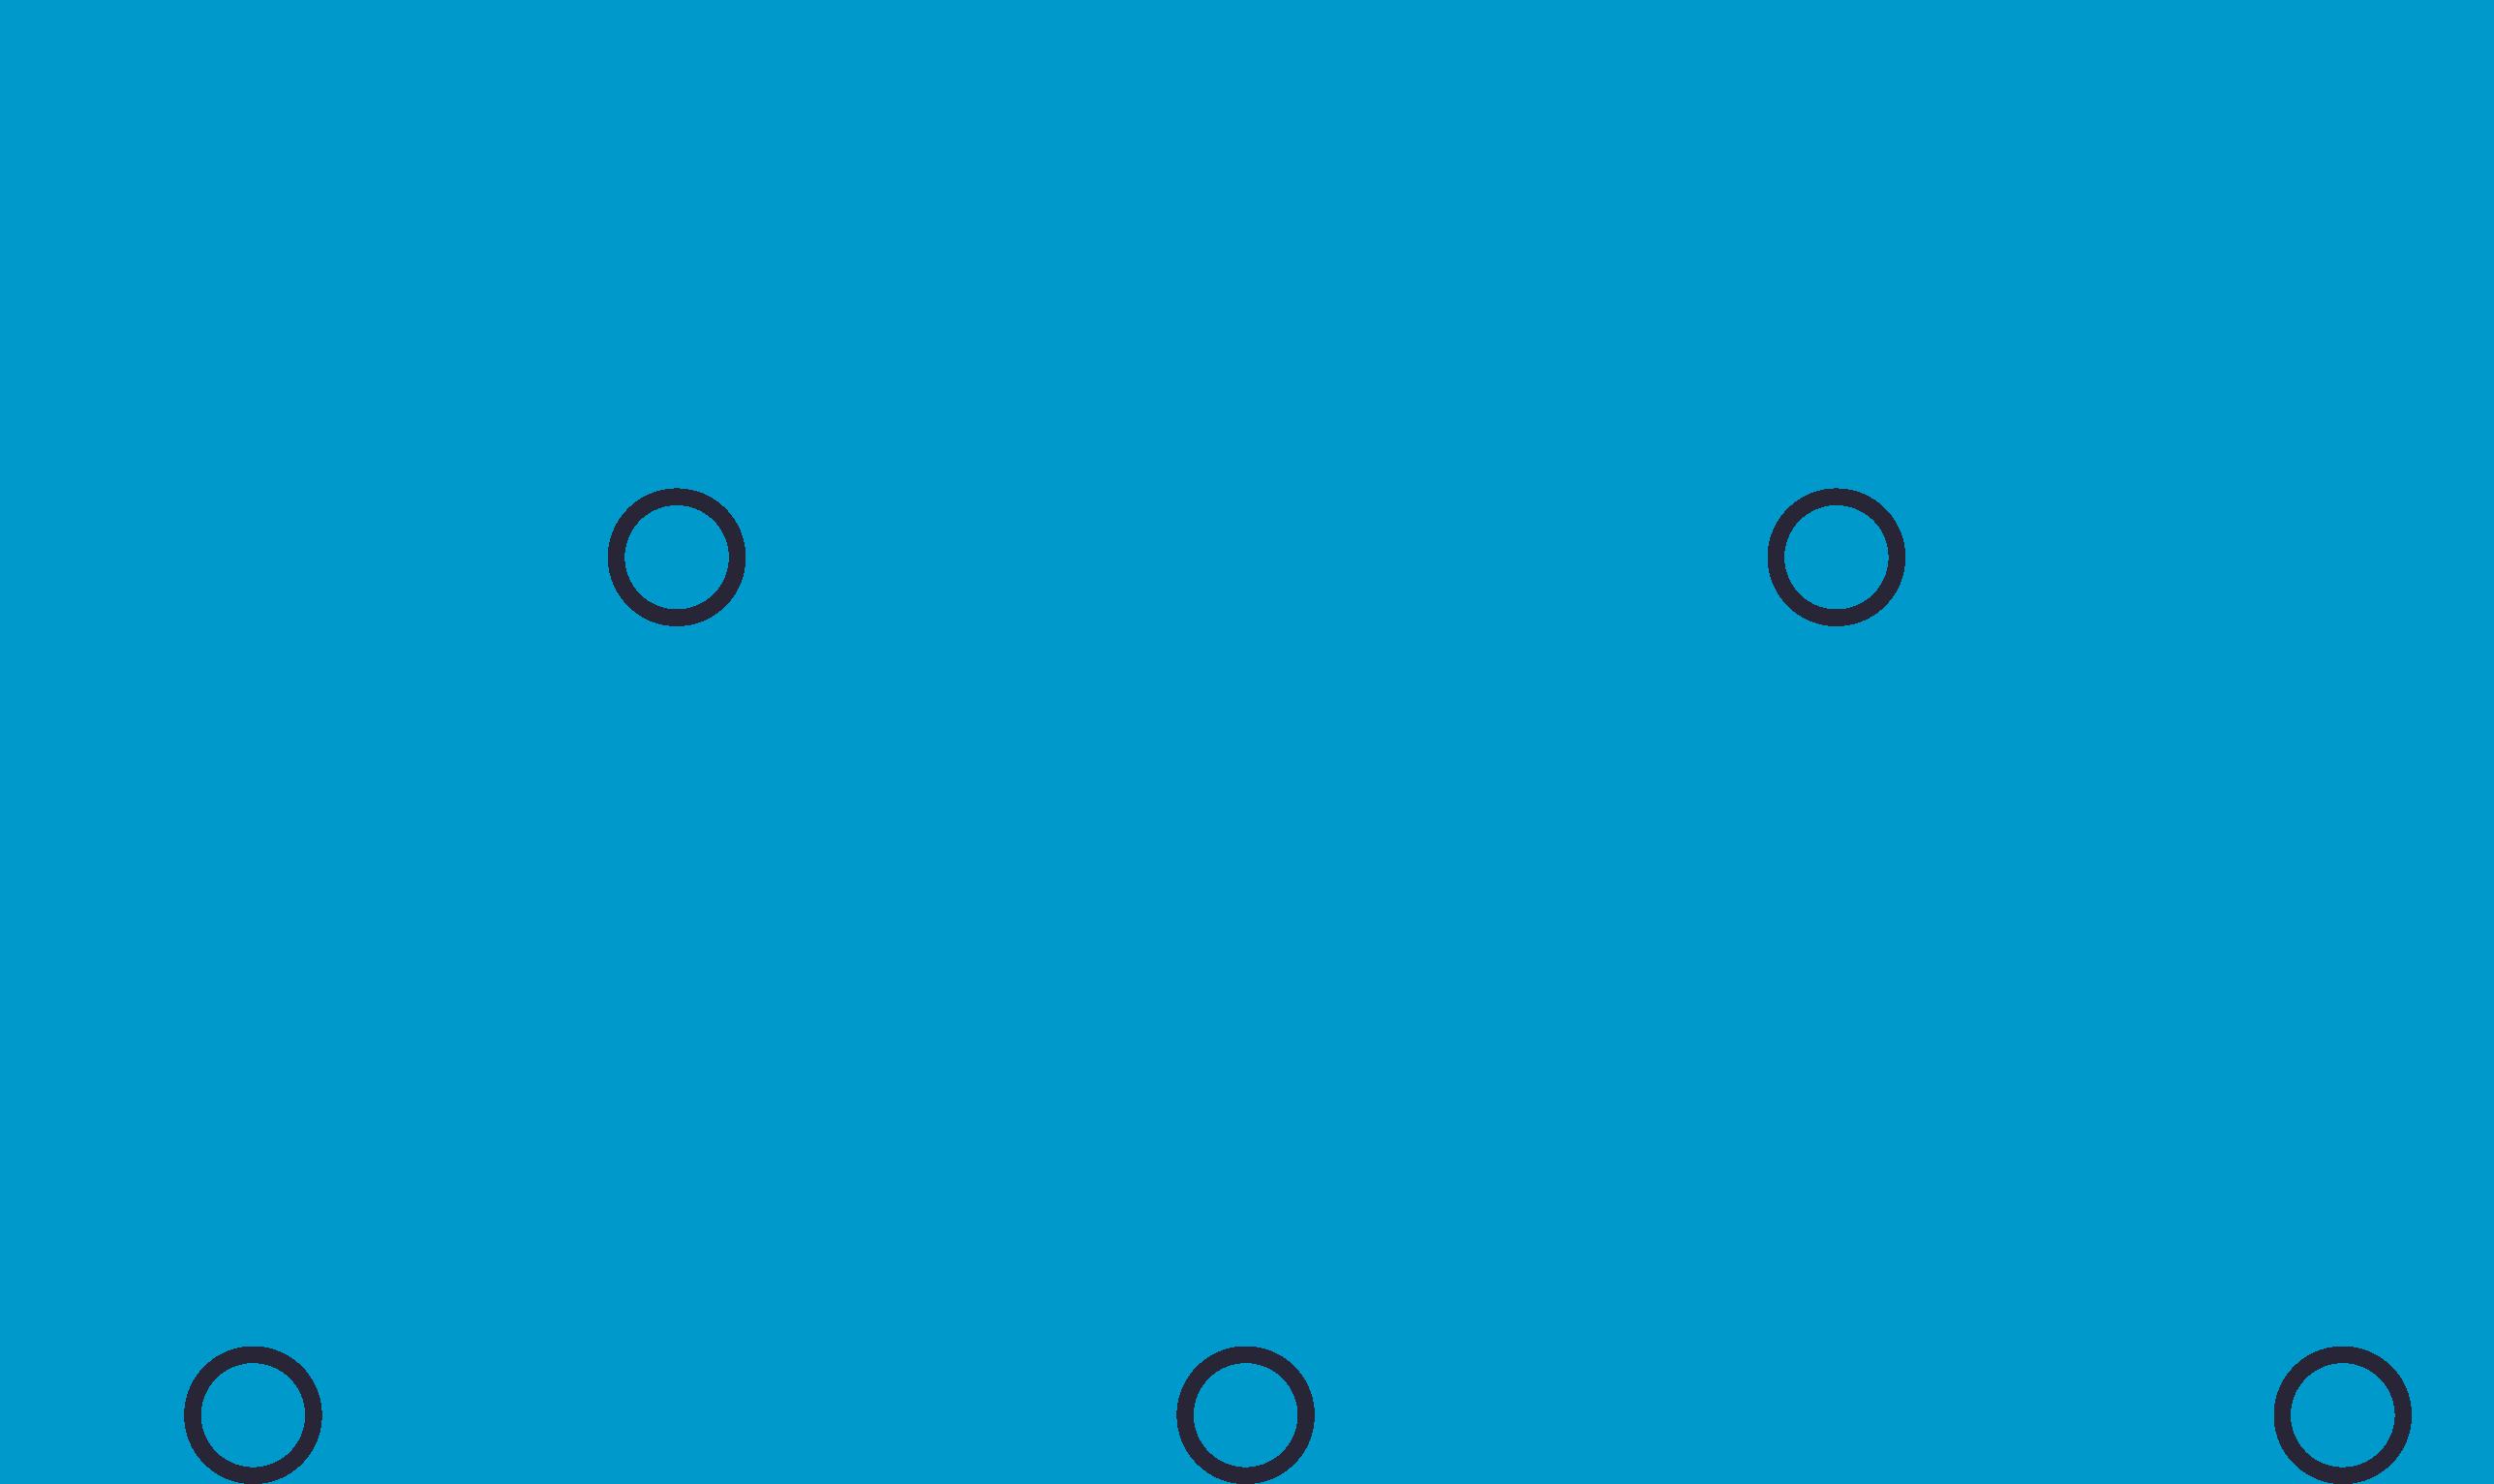 fabforce - Fallbeispiel I